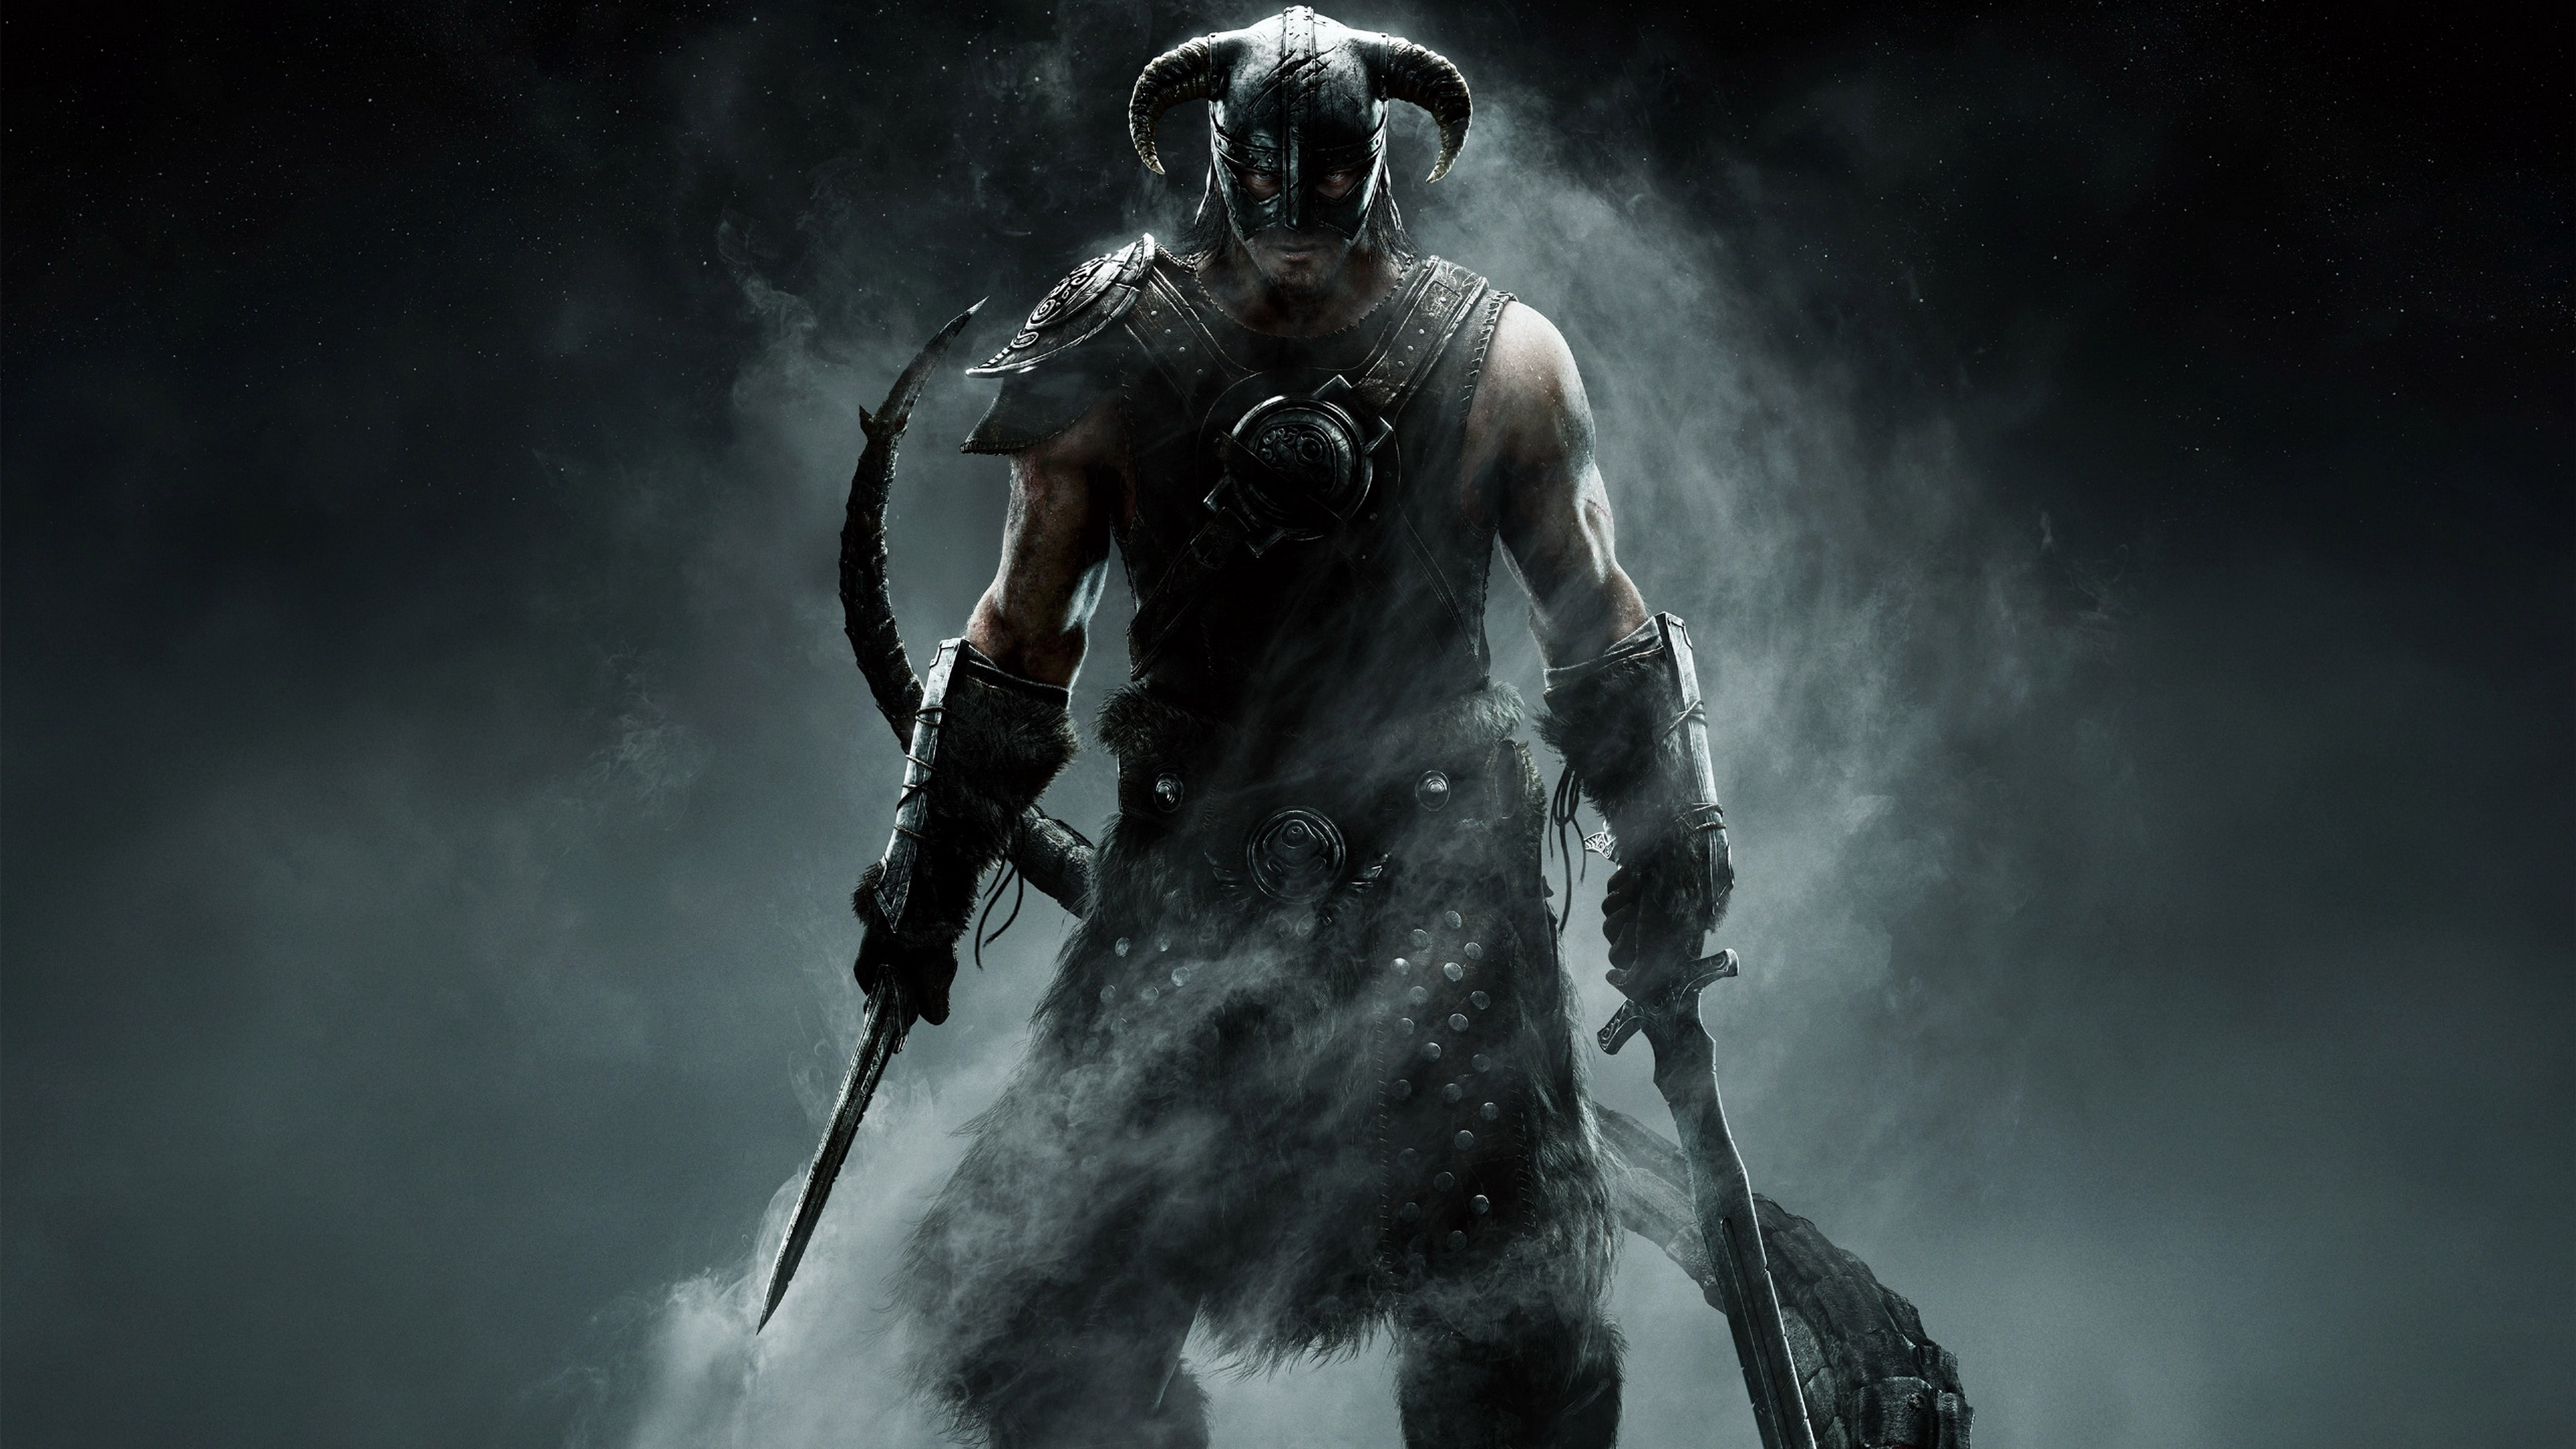 The Elder Scrolls V Skyrim Dawnguard Wallpaper Ultra HD 4k 3840x2160